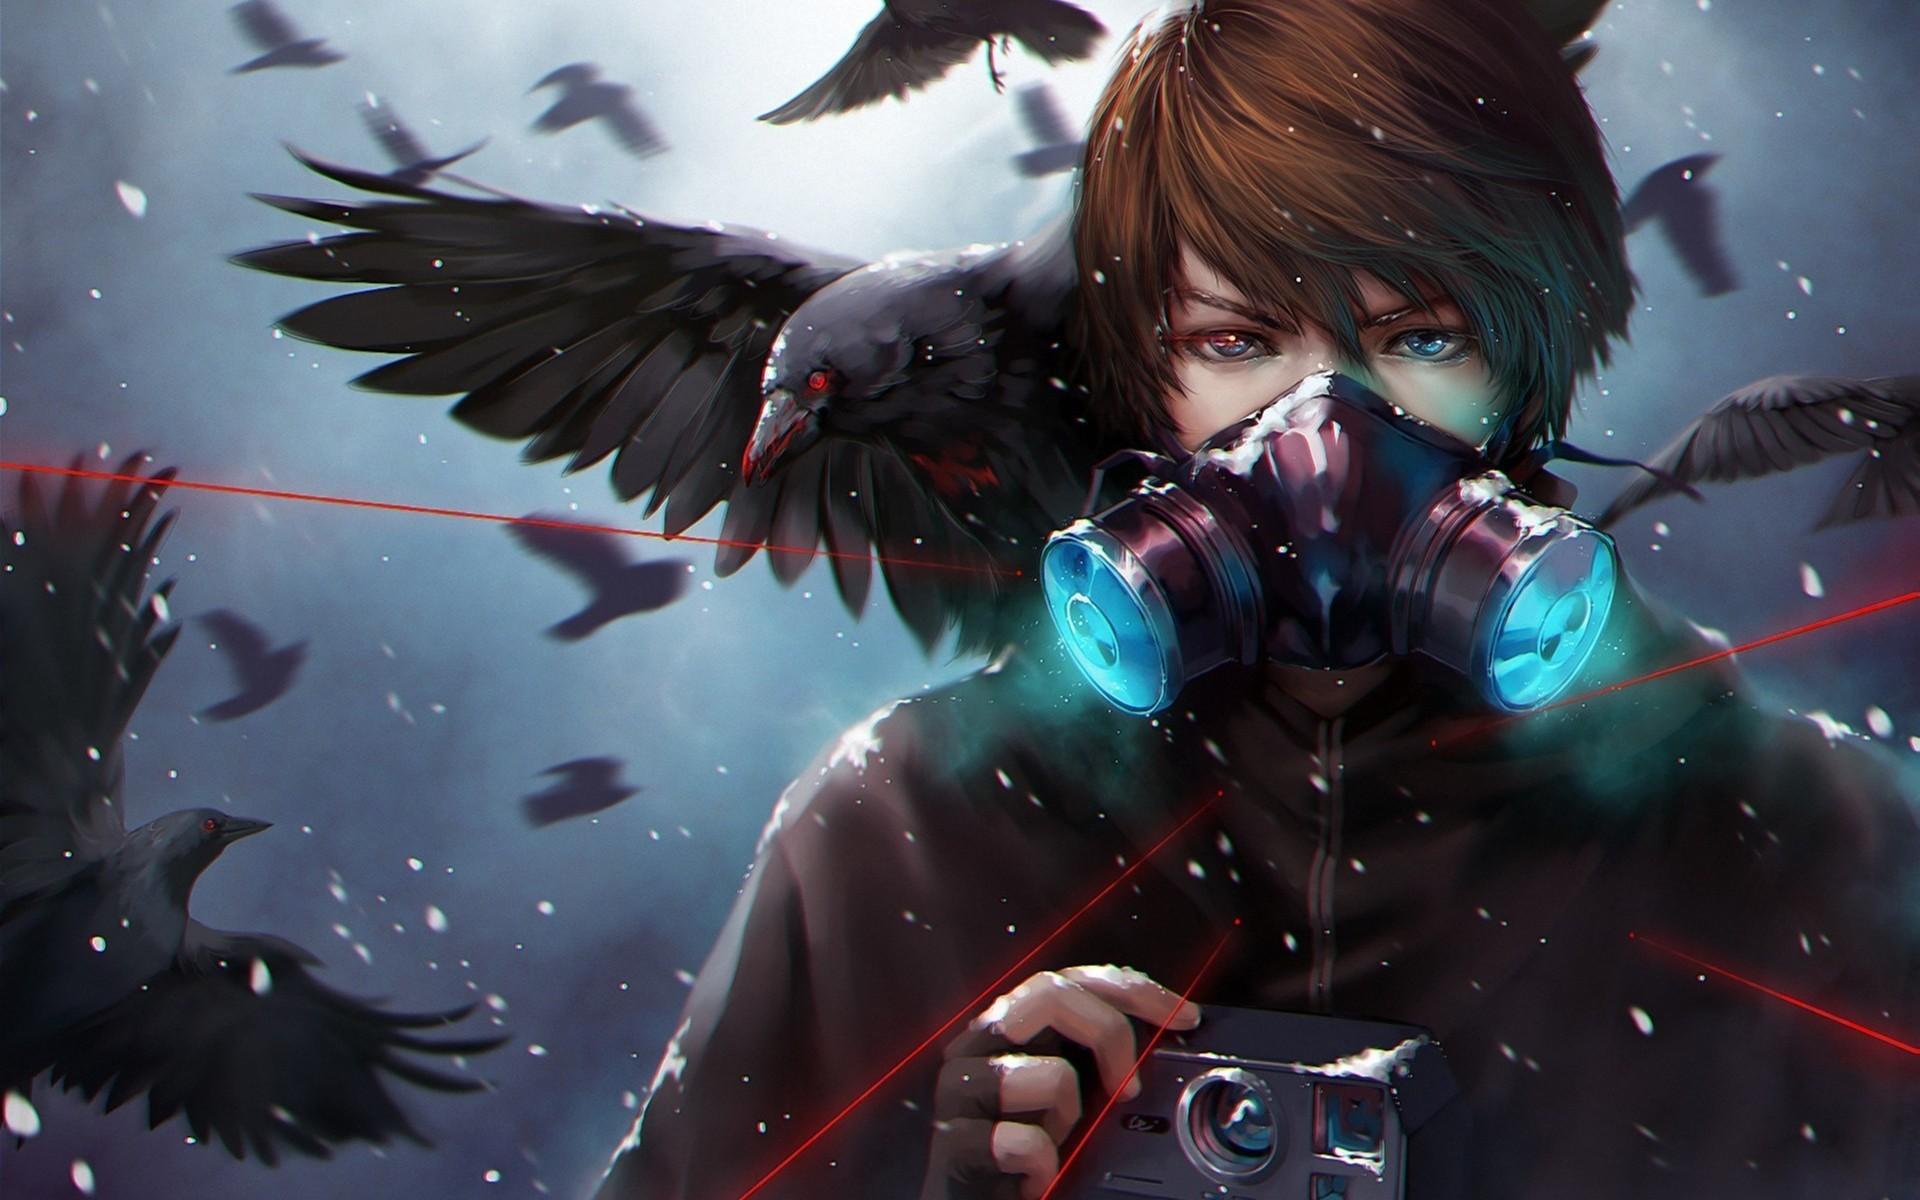 fantasy art dark anime gas masks crow screenshot computer wallpaper fictional character 114242